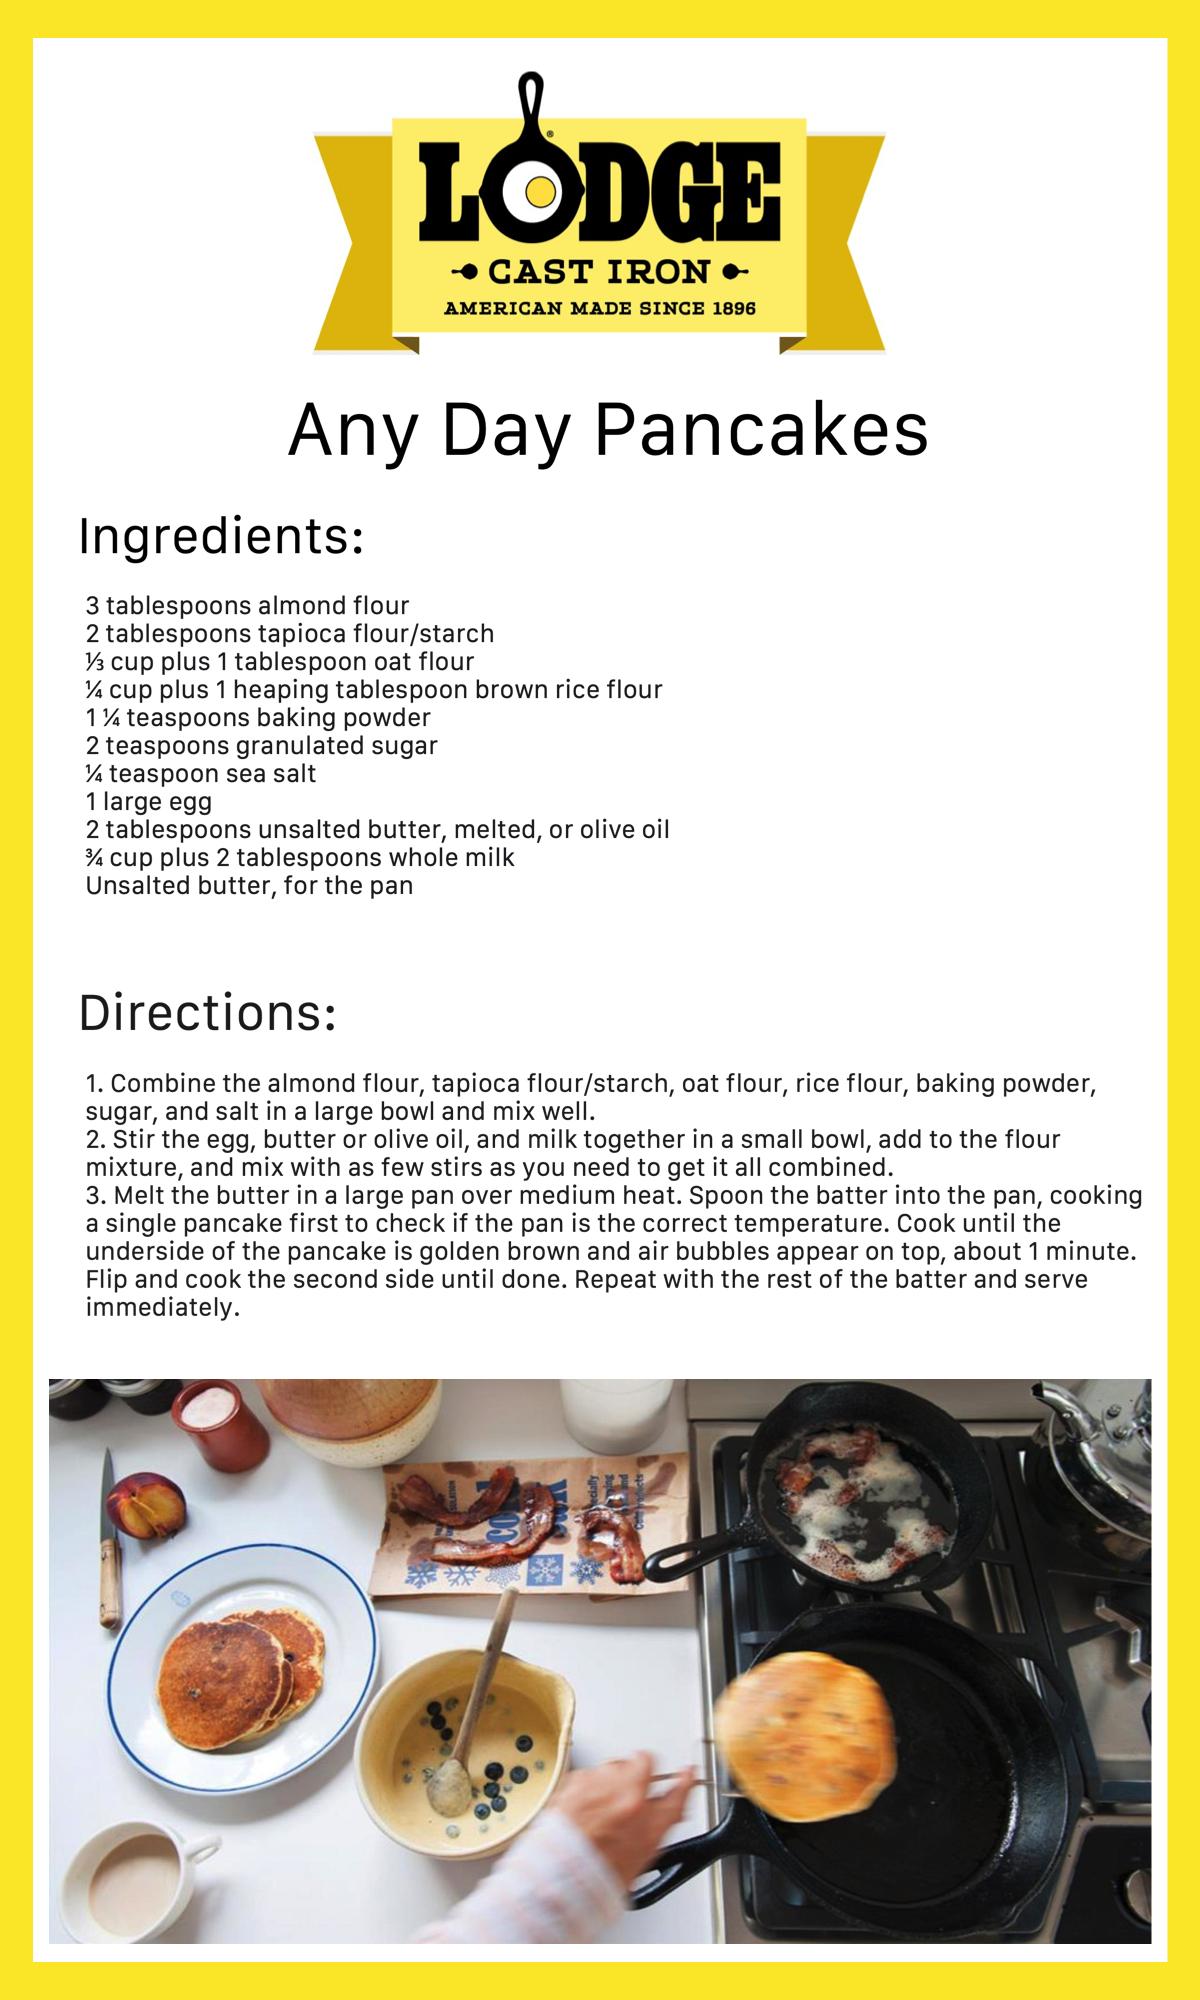 any-day-pancakes-lodge.jpg